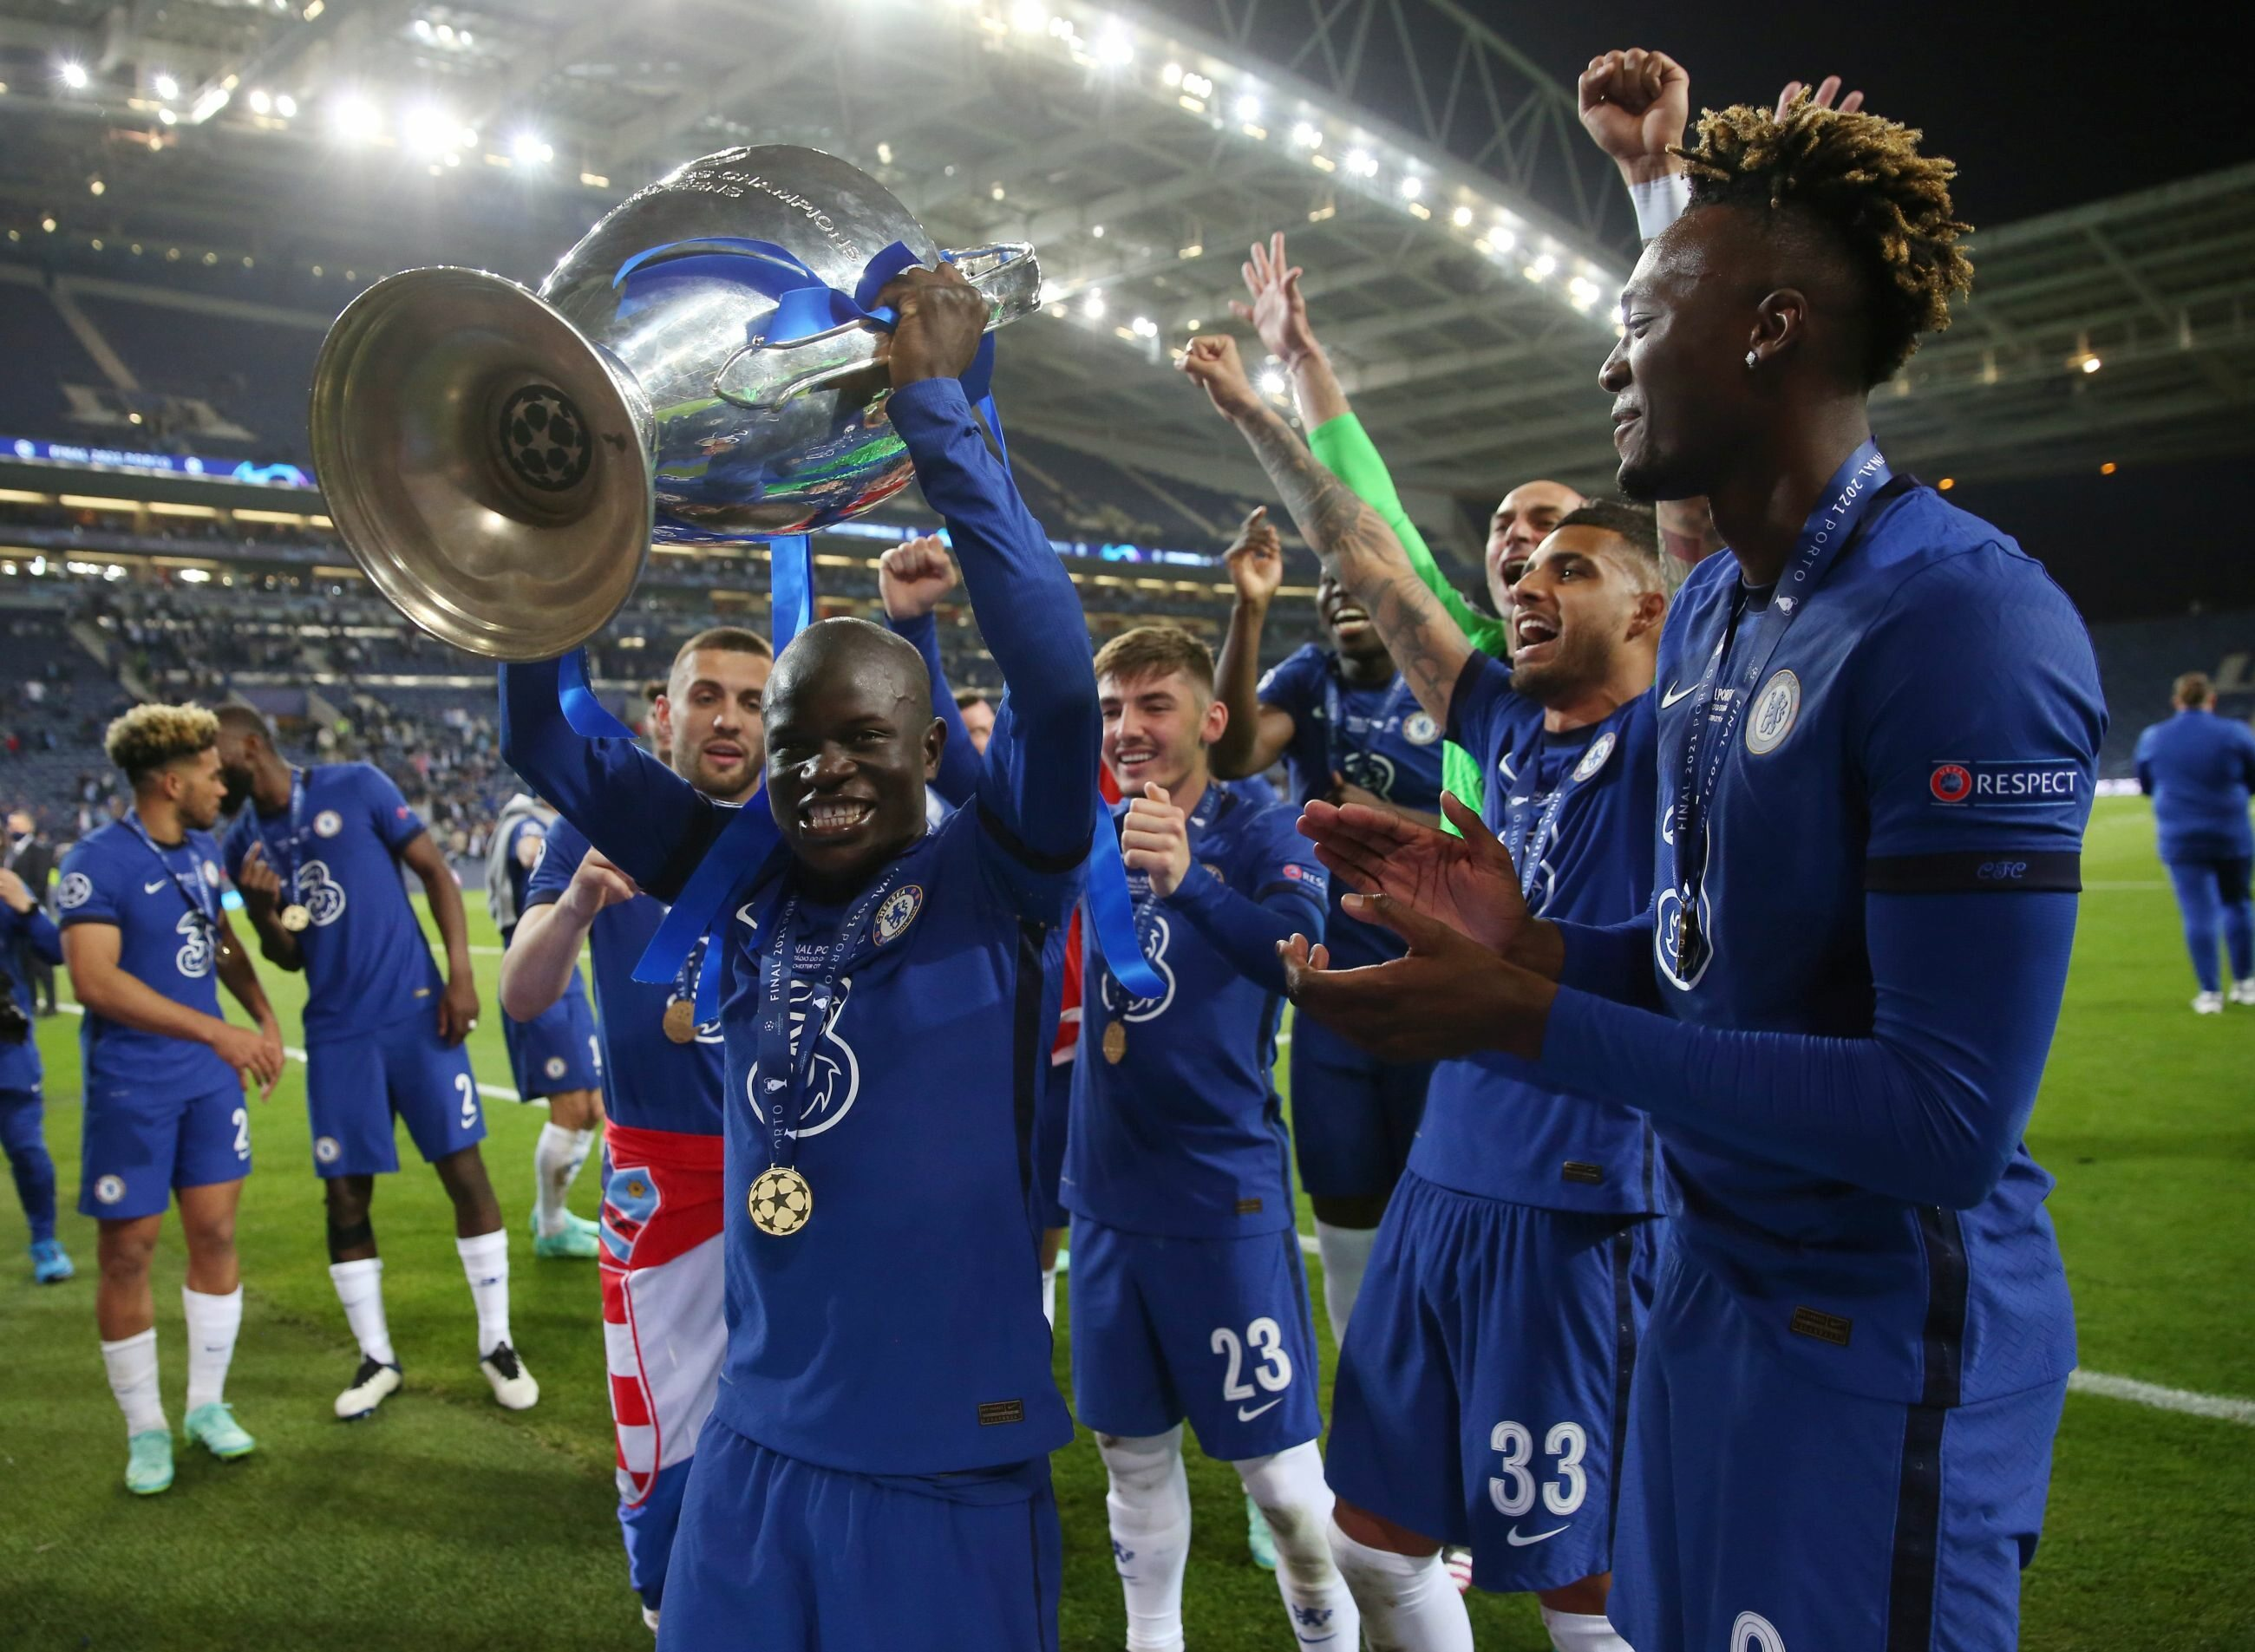 Superpuchar Europy. Chelsea – Villarreal. Transmisja na żywo